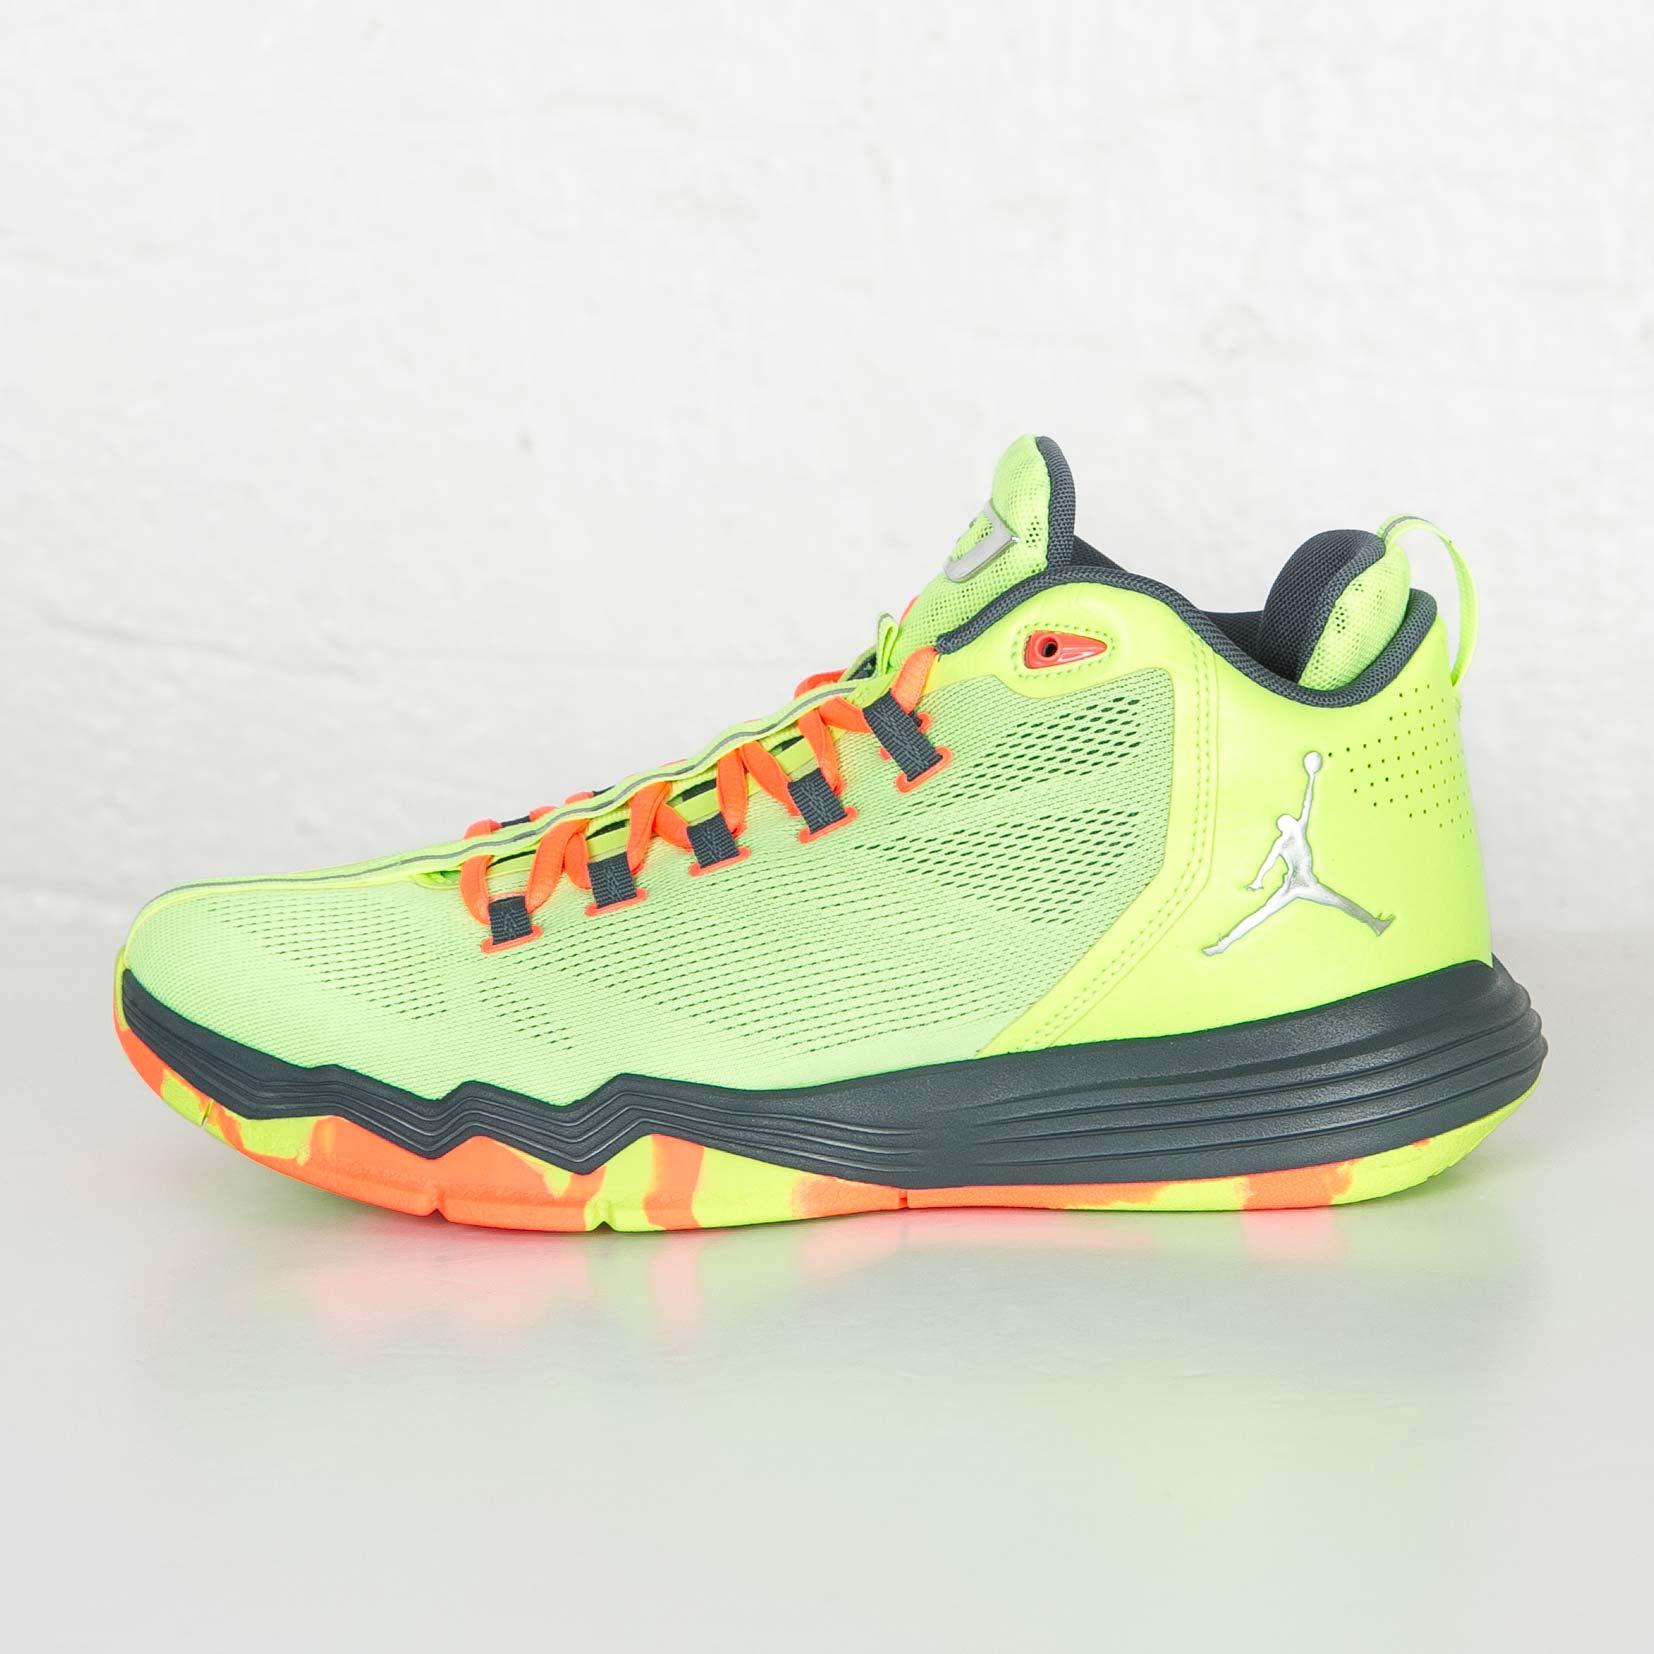 Jordan Brand Jordan CP3.IX AE - 833909-303 - Sneakersnstuff ... 073ccdcfe